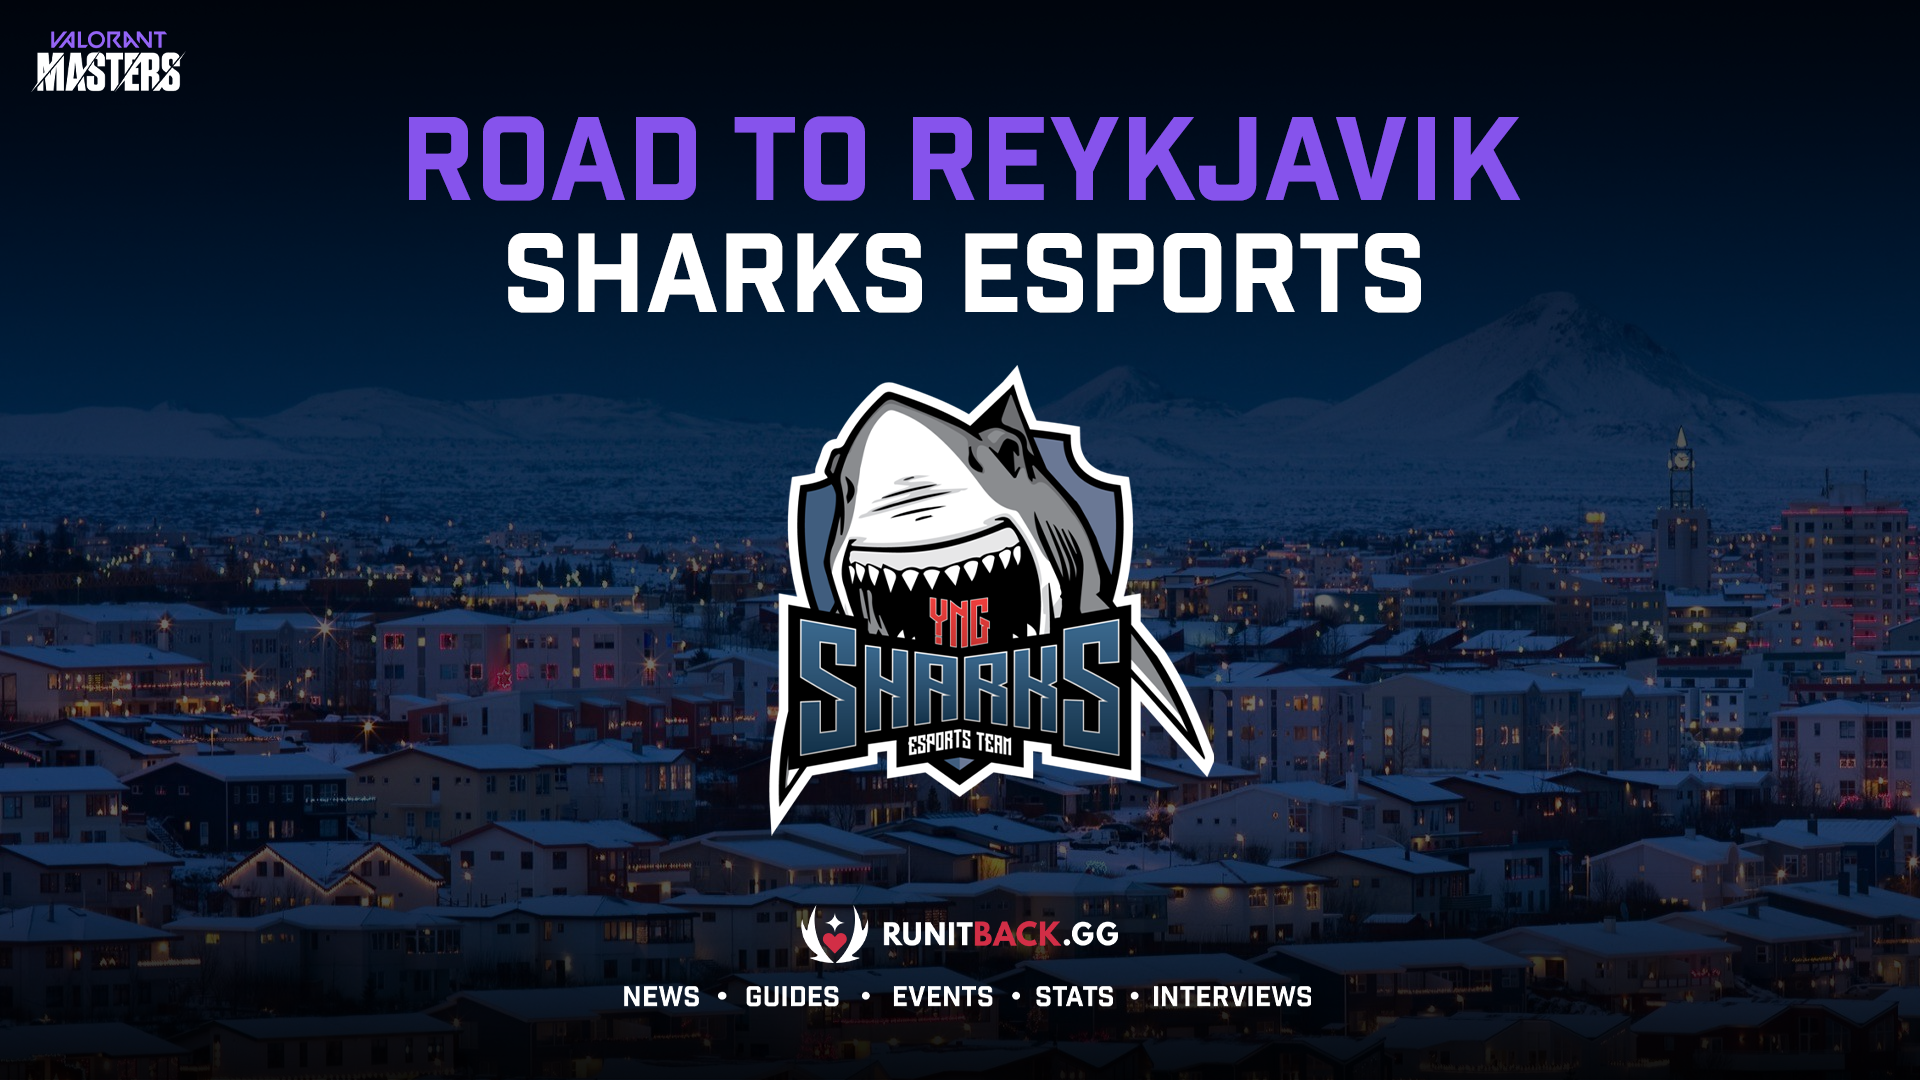 Road to Masters Reykjavik – Sharks Esports